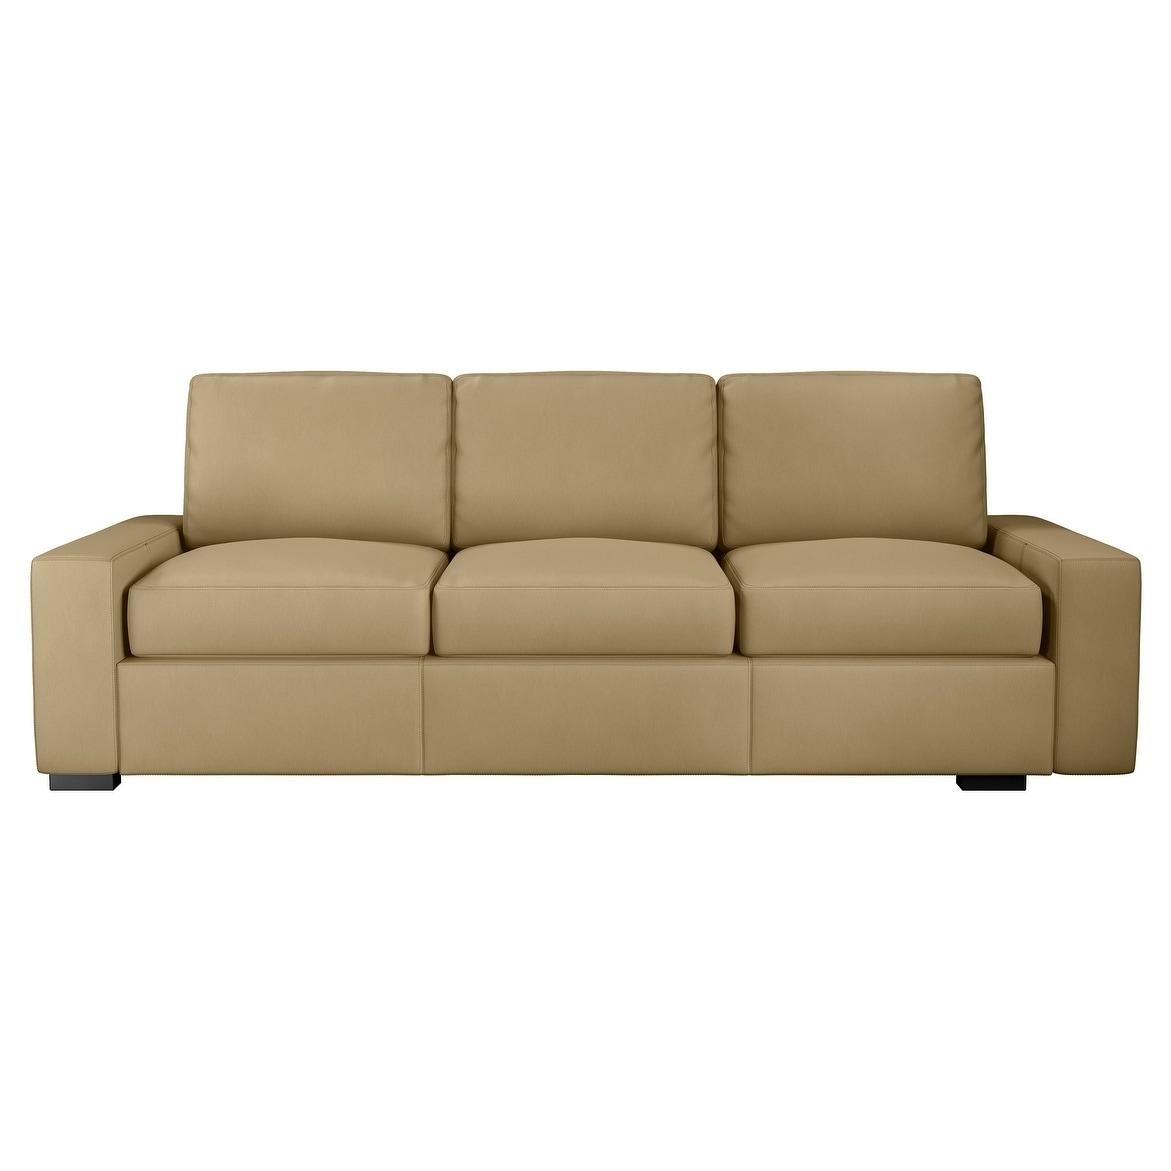 Monza Leather Sofa Taraba Home Review